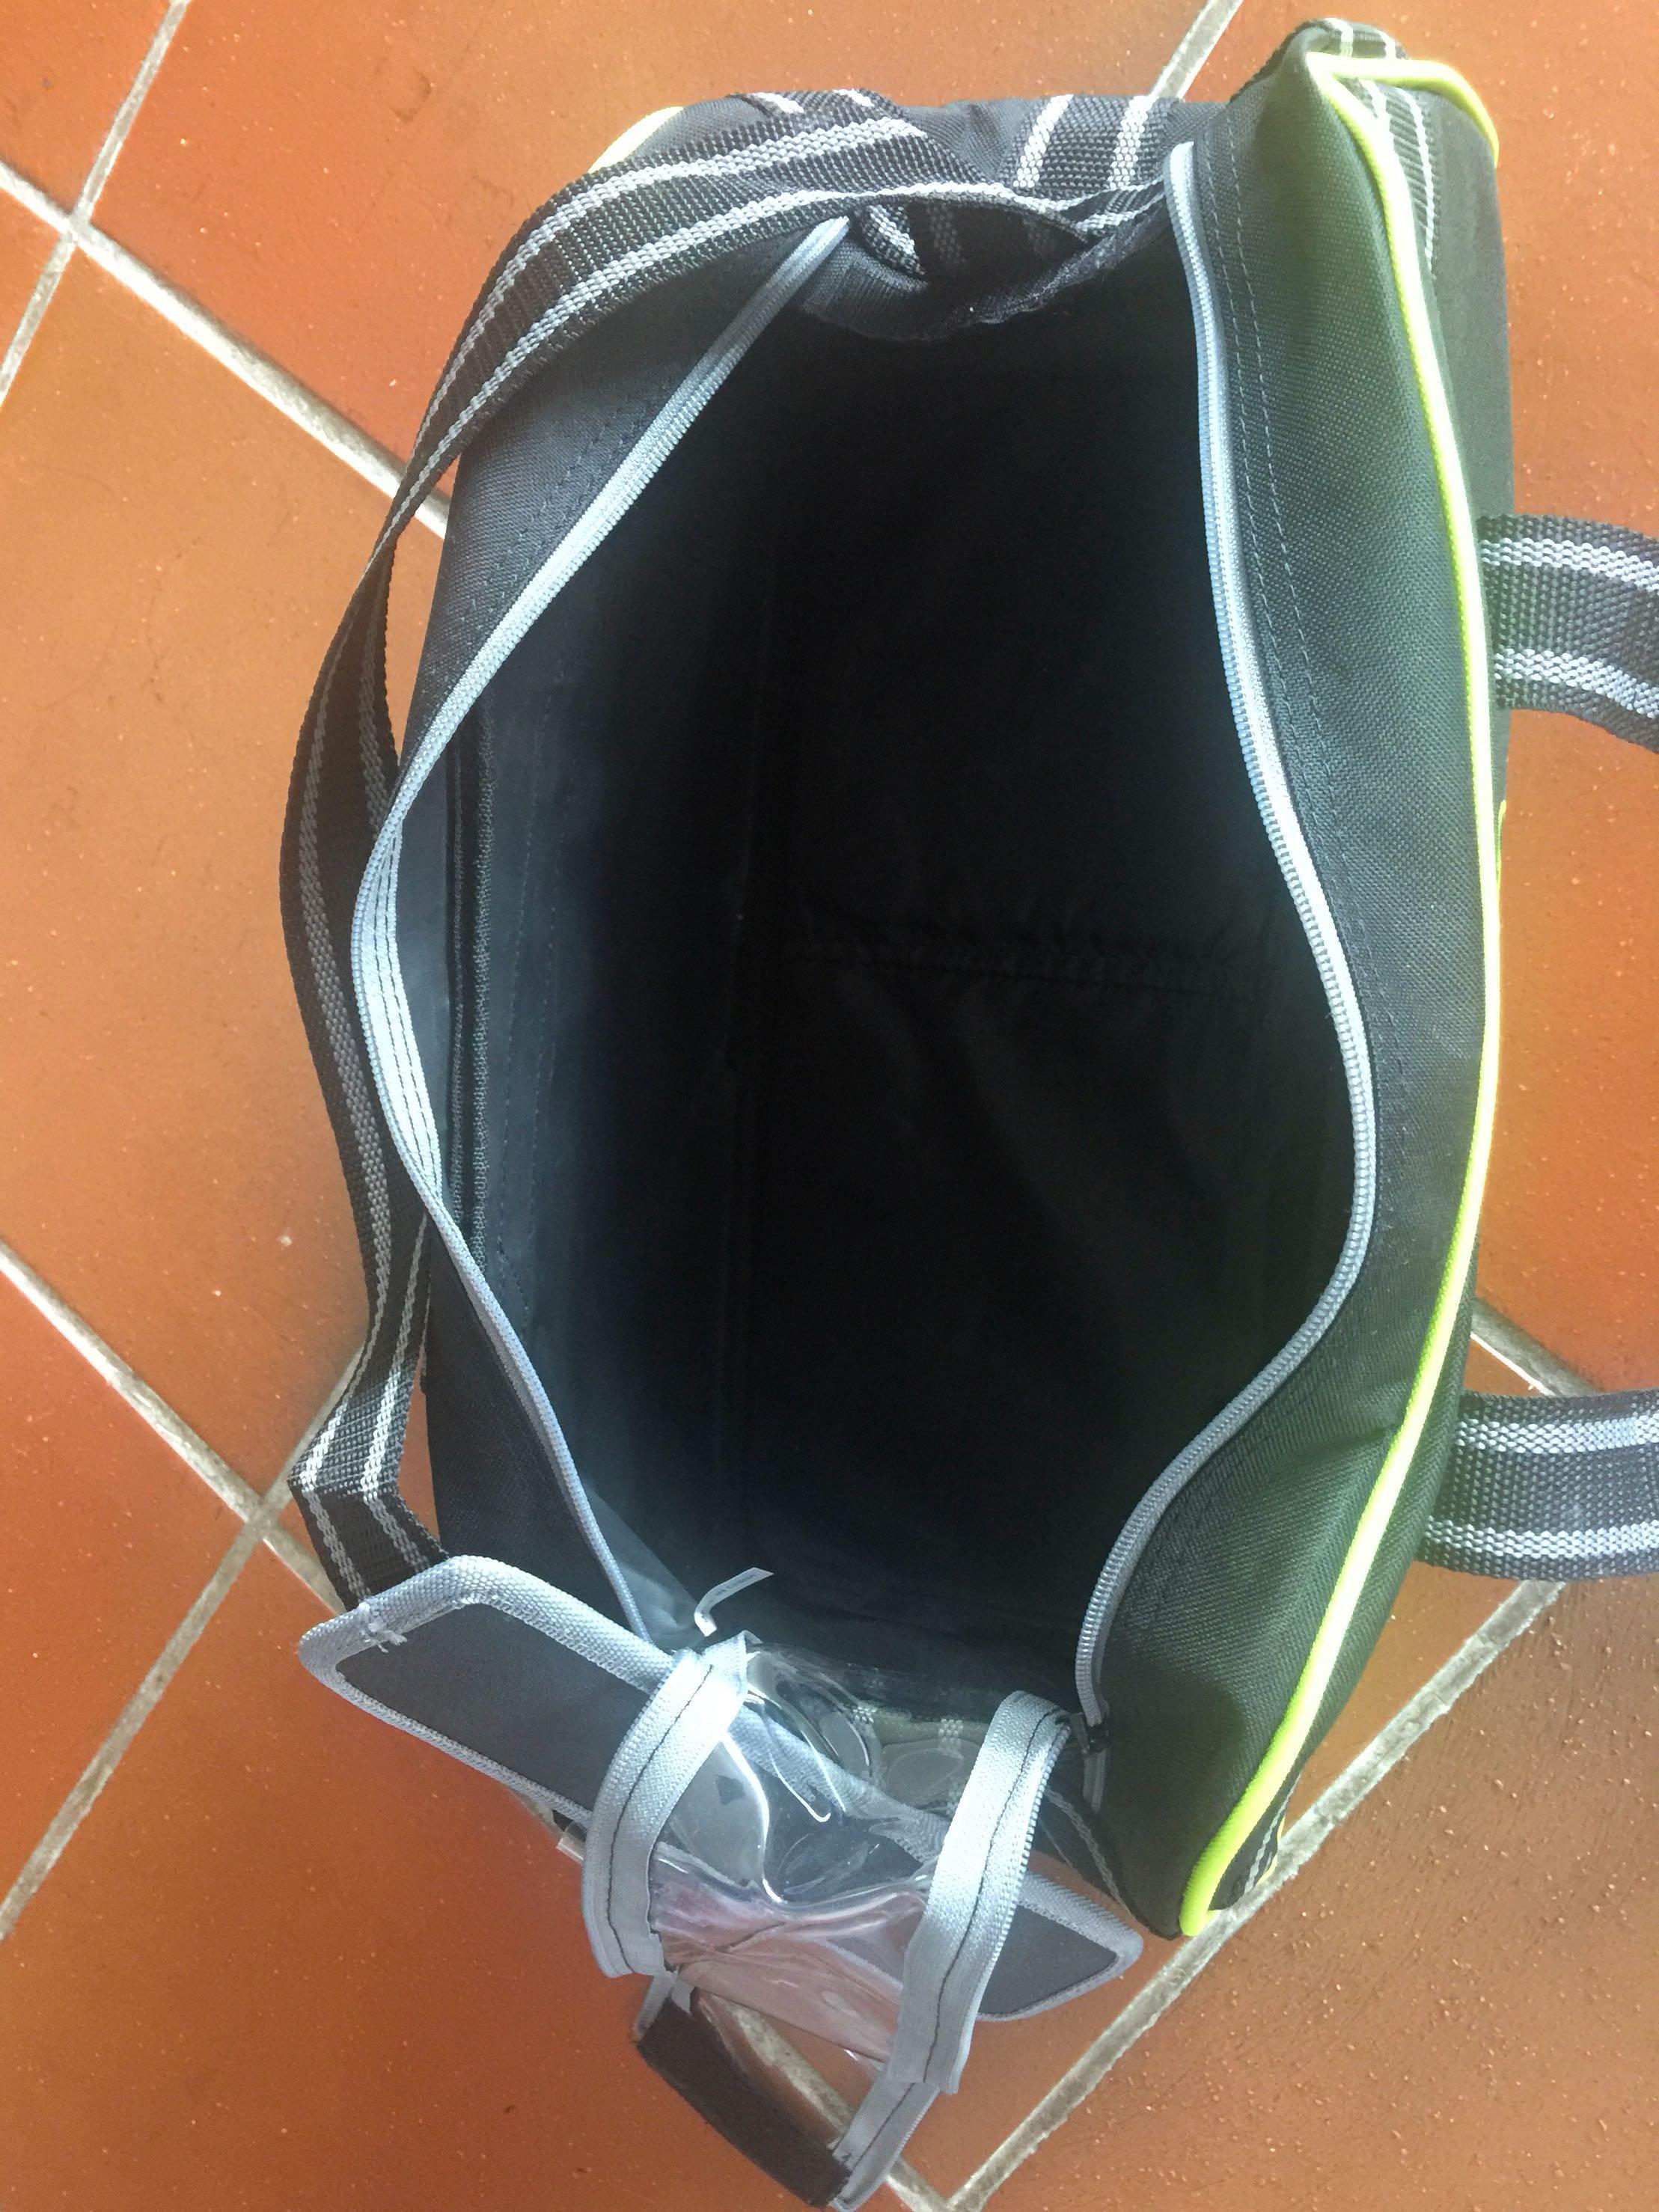 Storm 2 balls Bowling tote bag